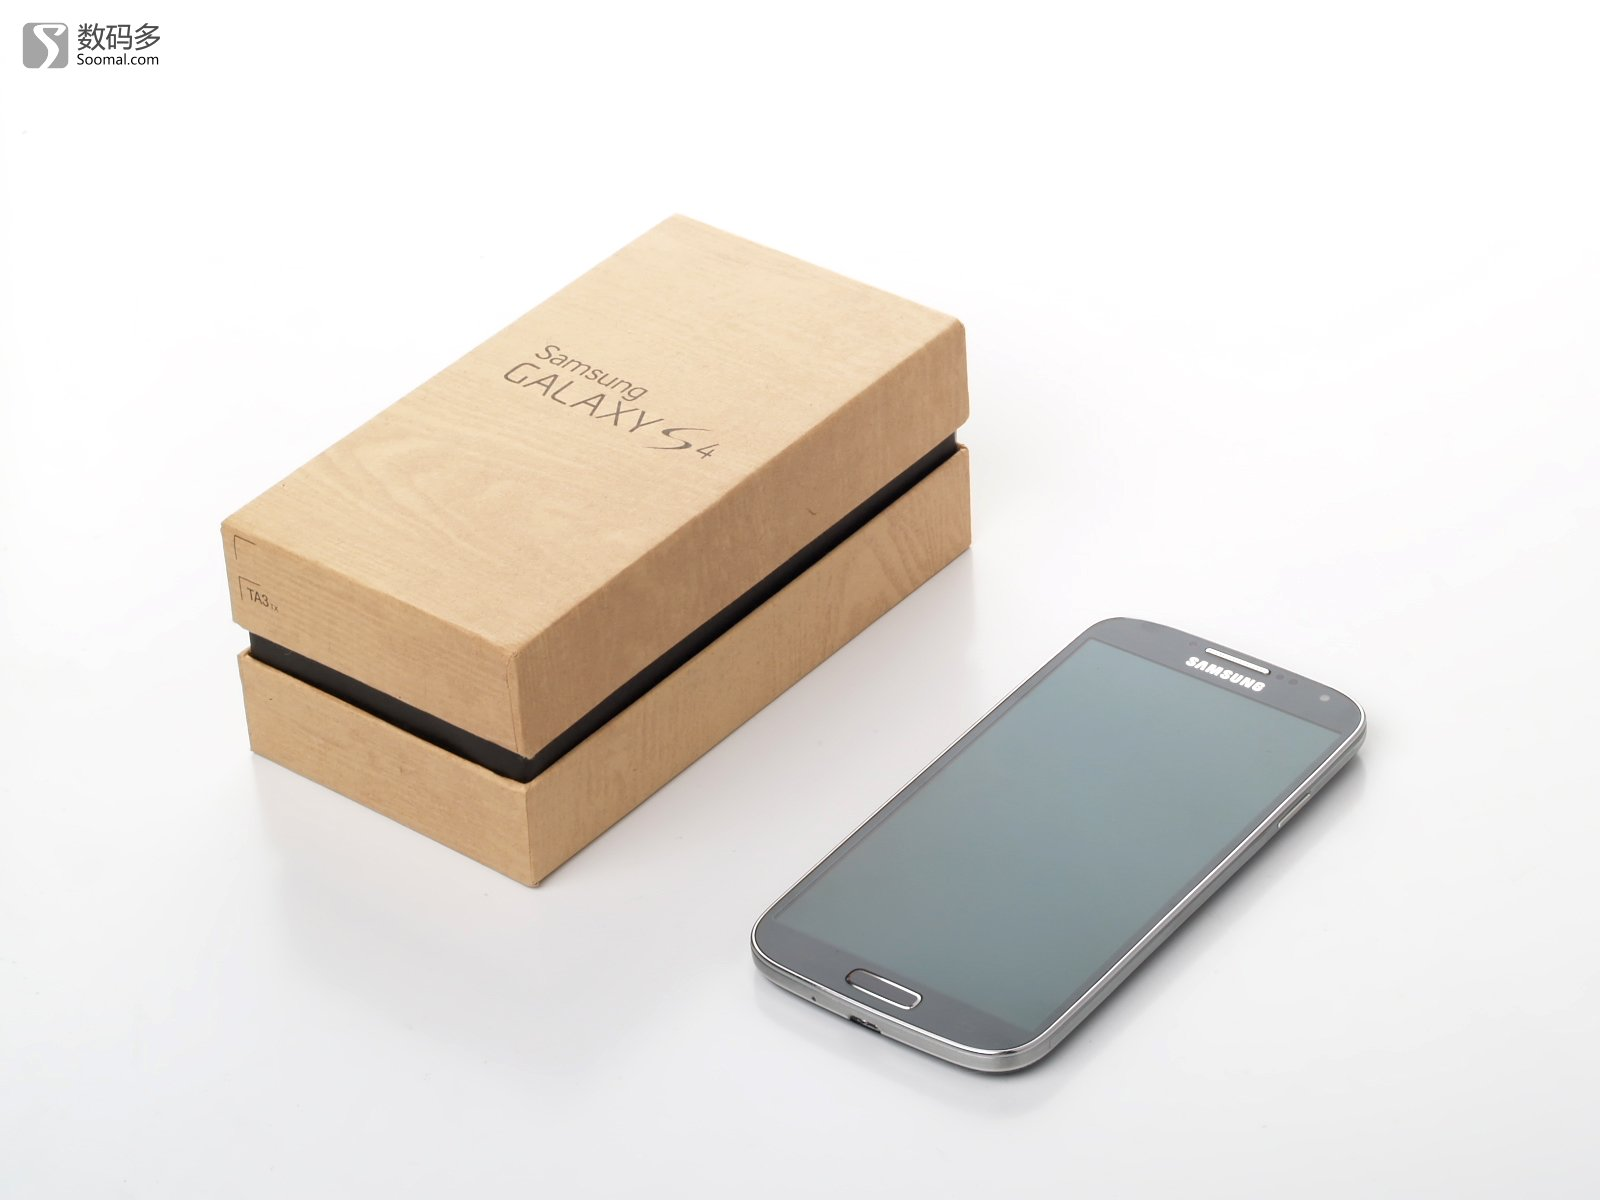 Samsung galaxy s4 - Mini tablette samsung prix ...